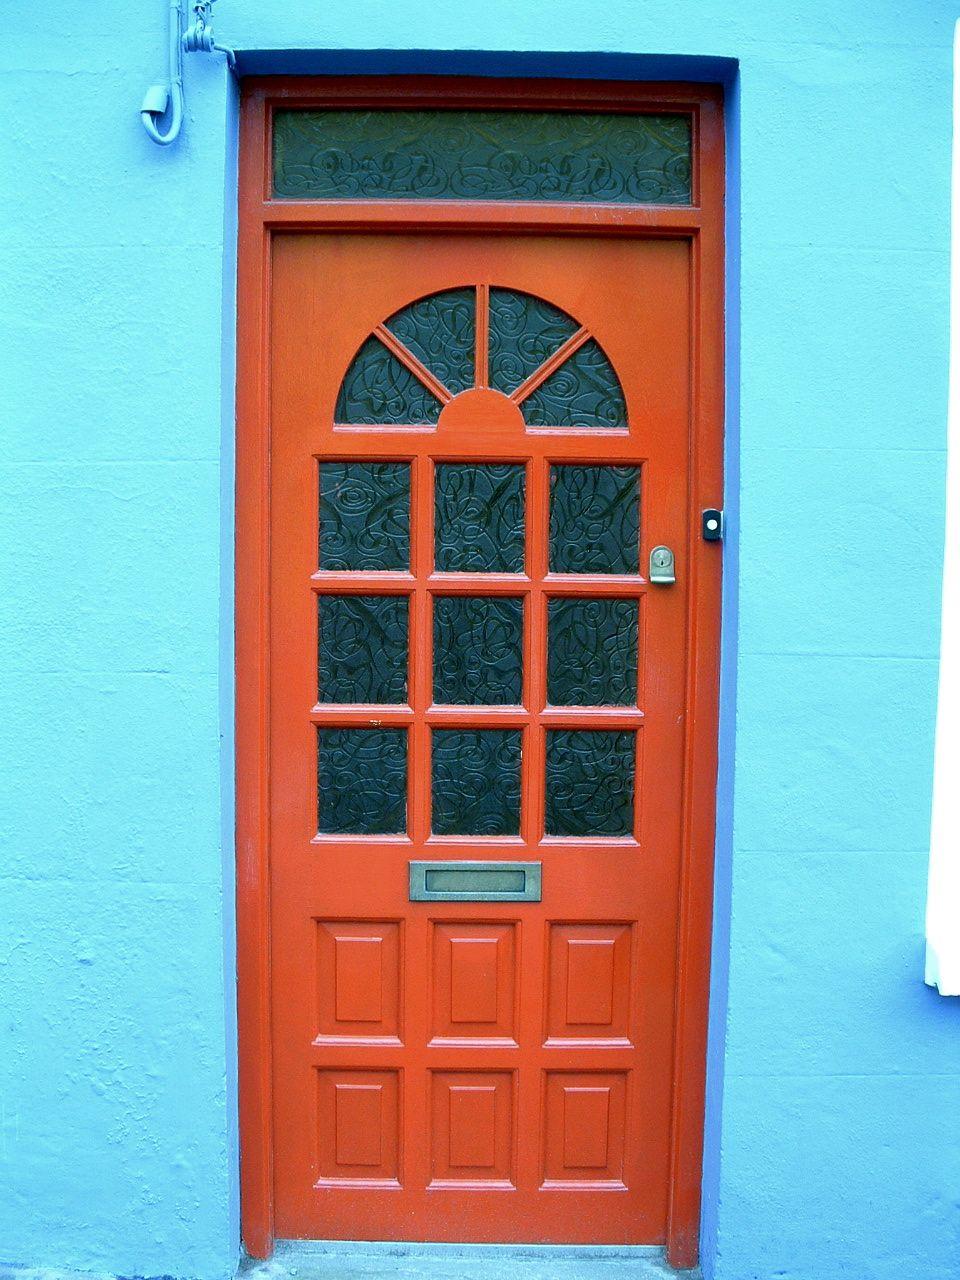 Spring Irish St. Patrick's Day Wreath | Etsy in 2020 ...  |Ireland Door Decorations